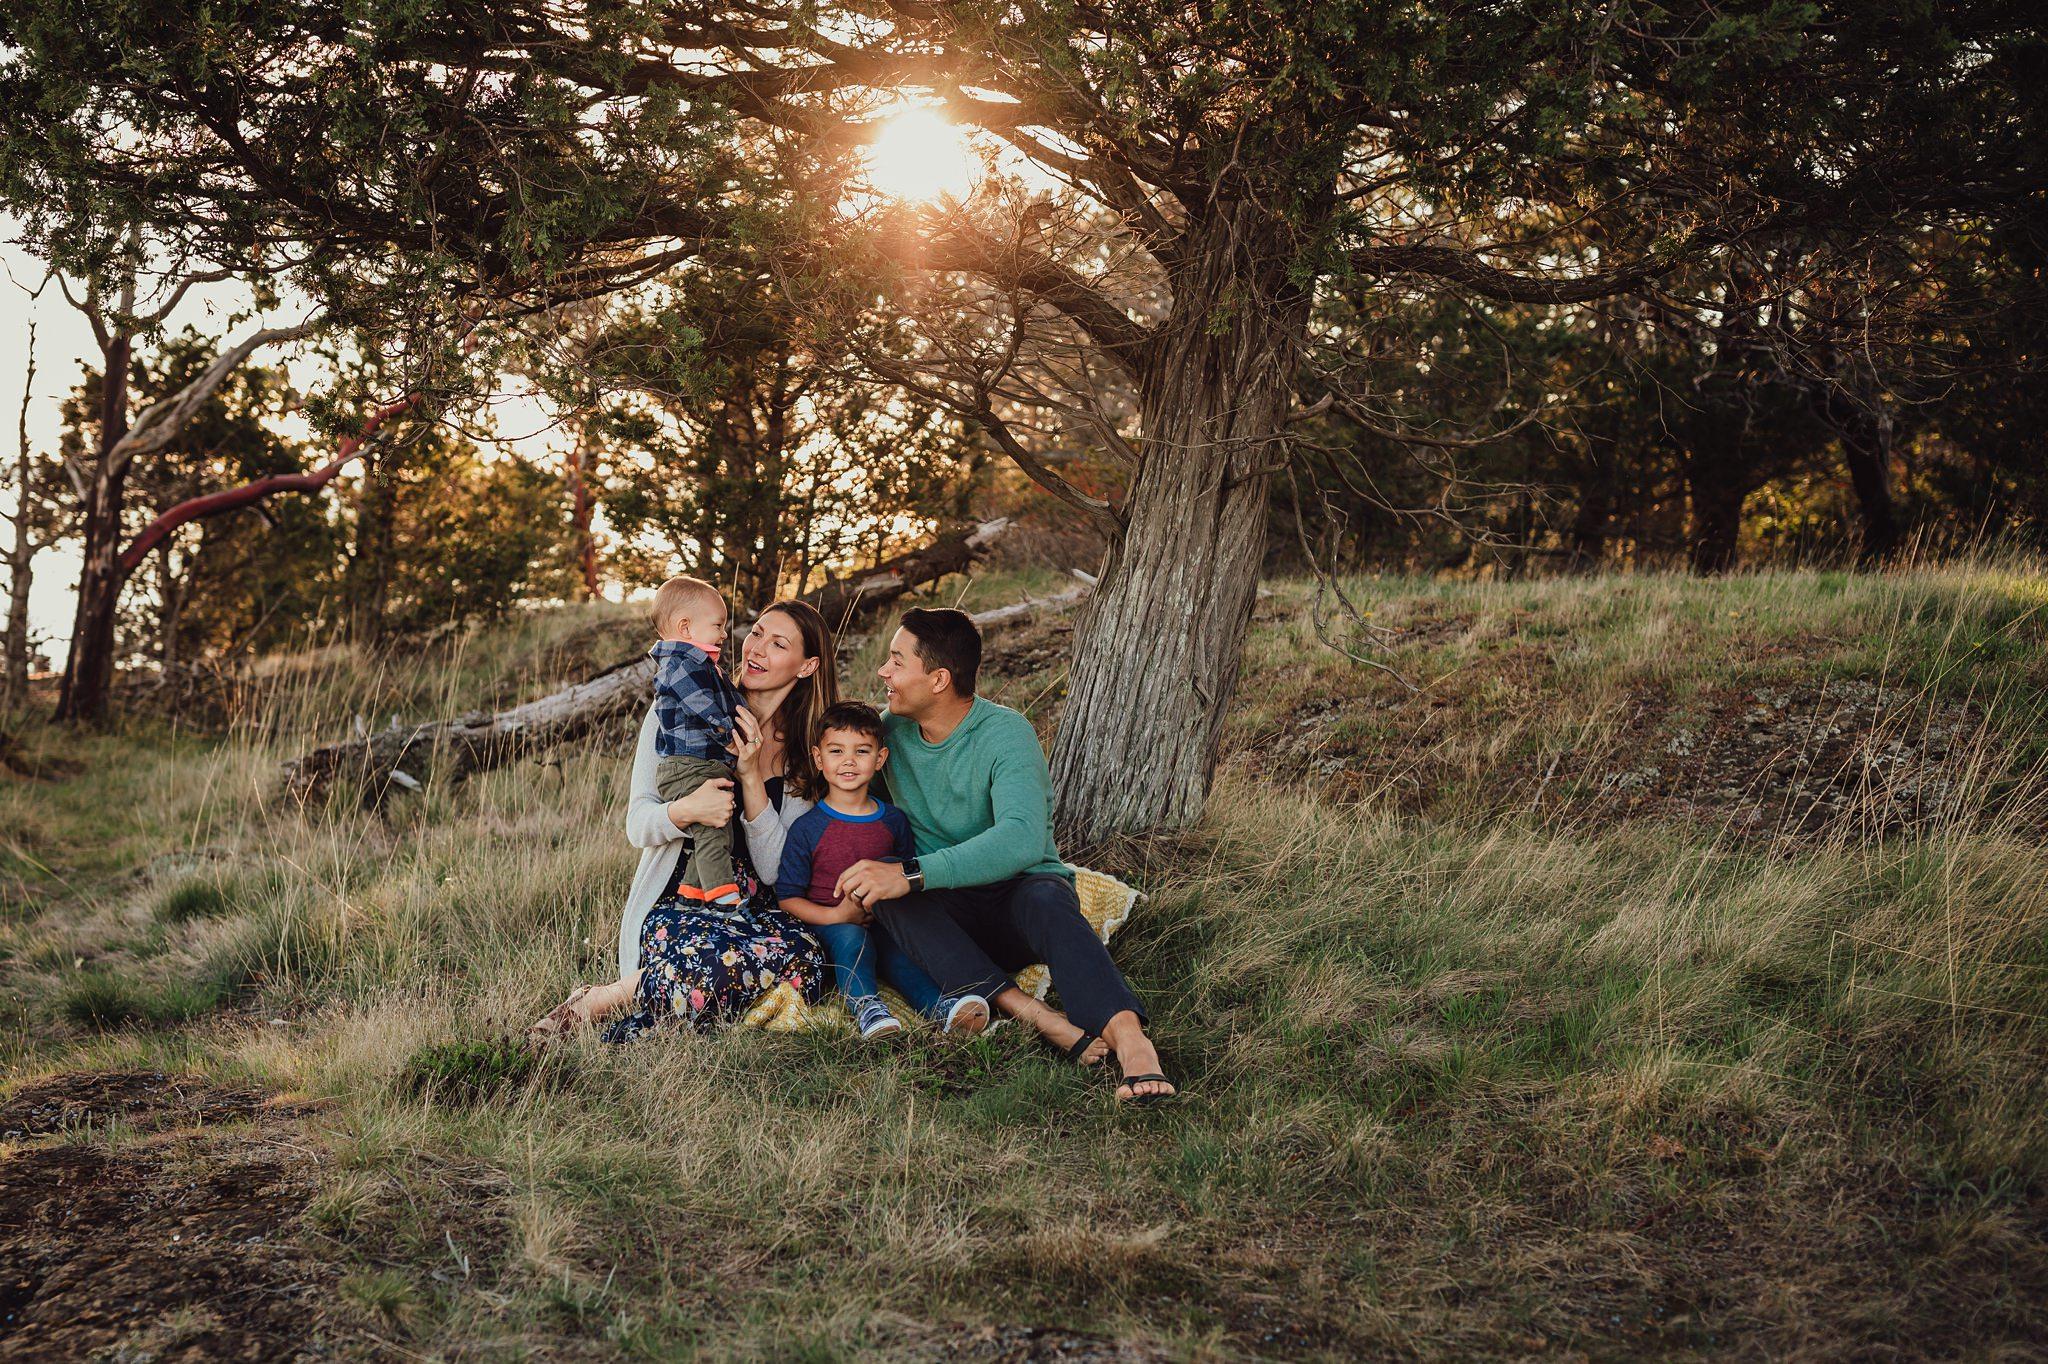 golden hour session at Washington Park Anacortes